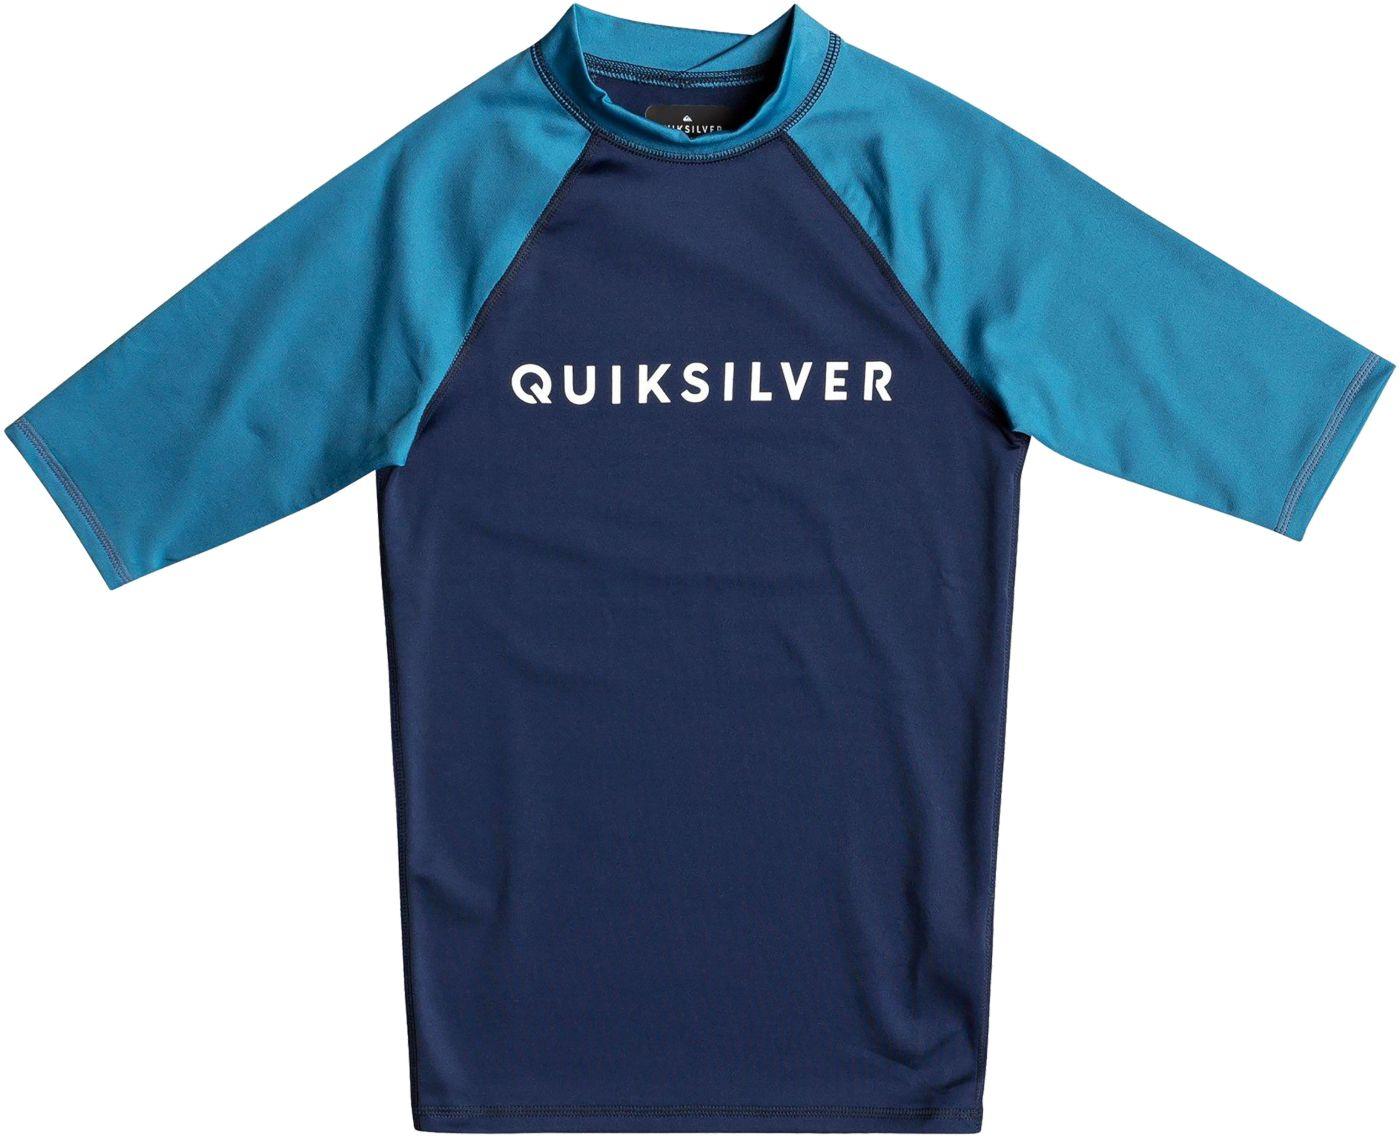 Quiksilver Boys' Always There Short Sleeve Rash Guard